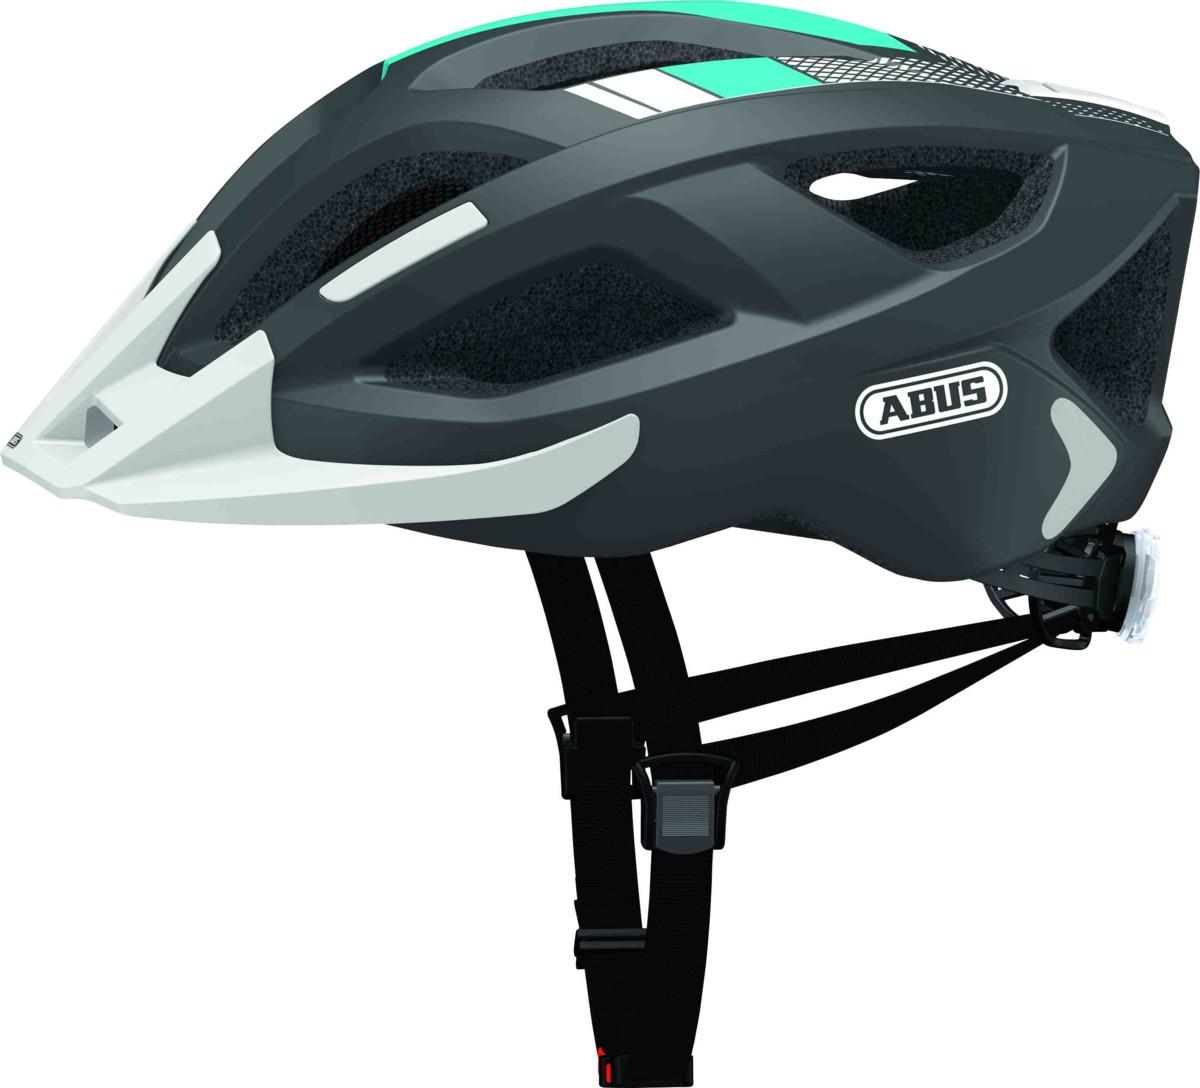 Aduro 2.0 race grey - Aduro 2.0 race grey L